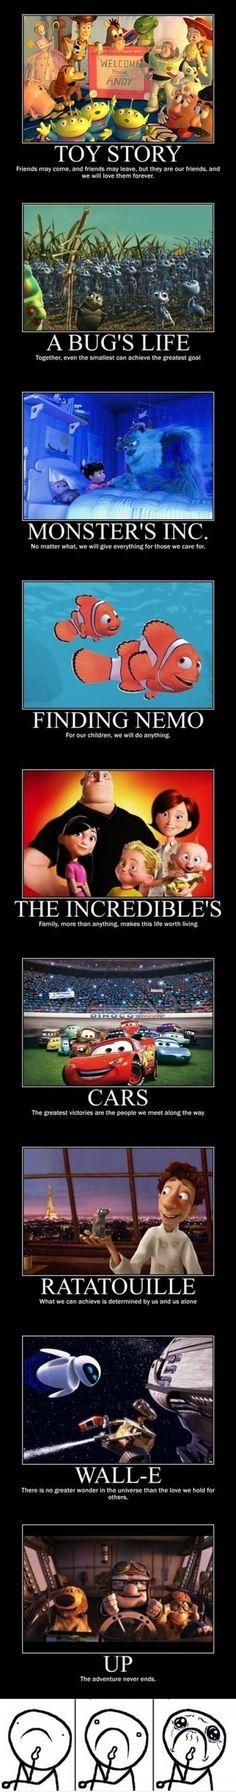 Disney's Pixar